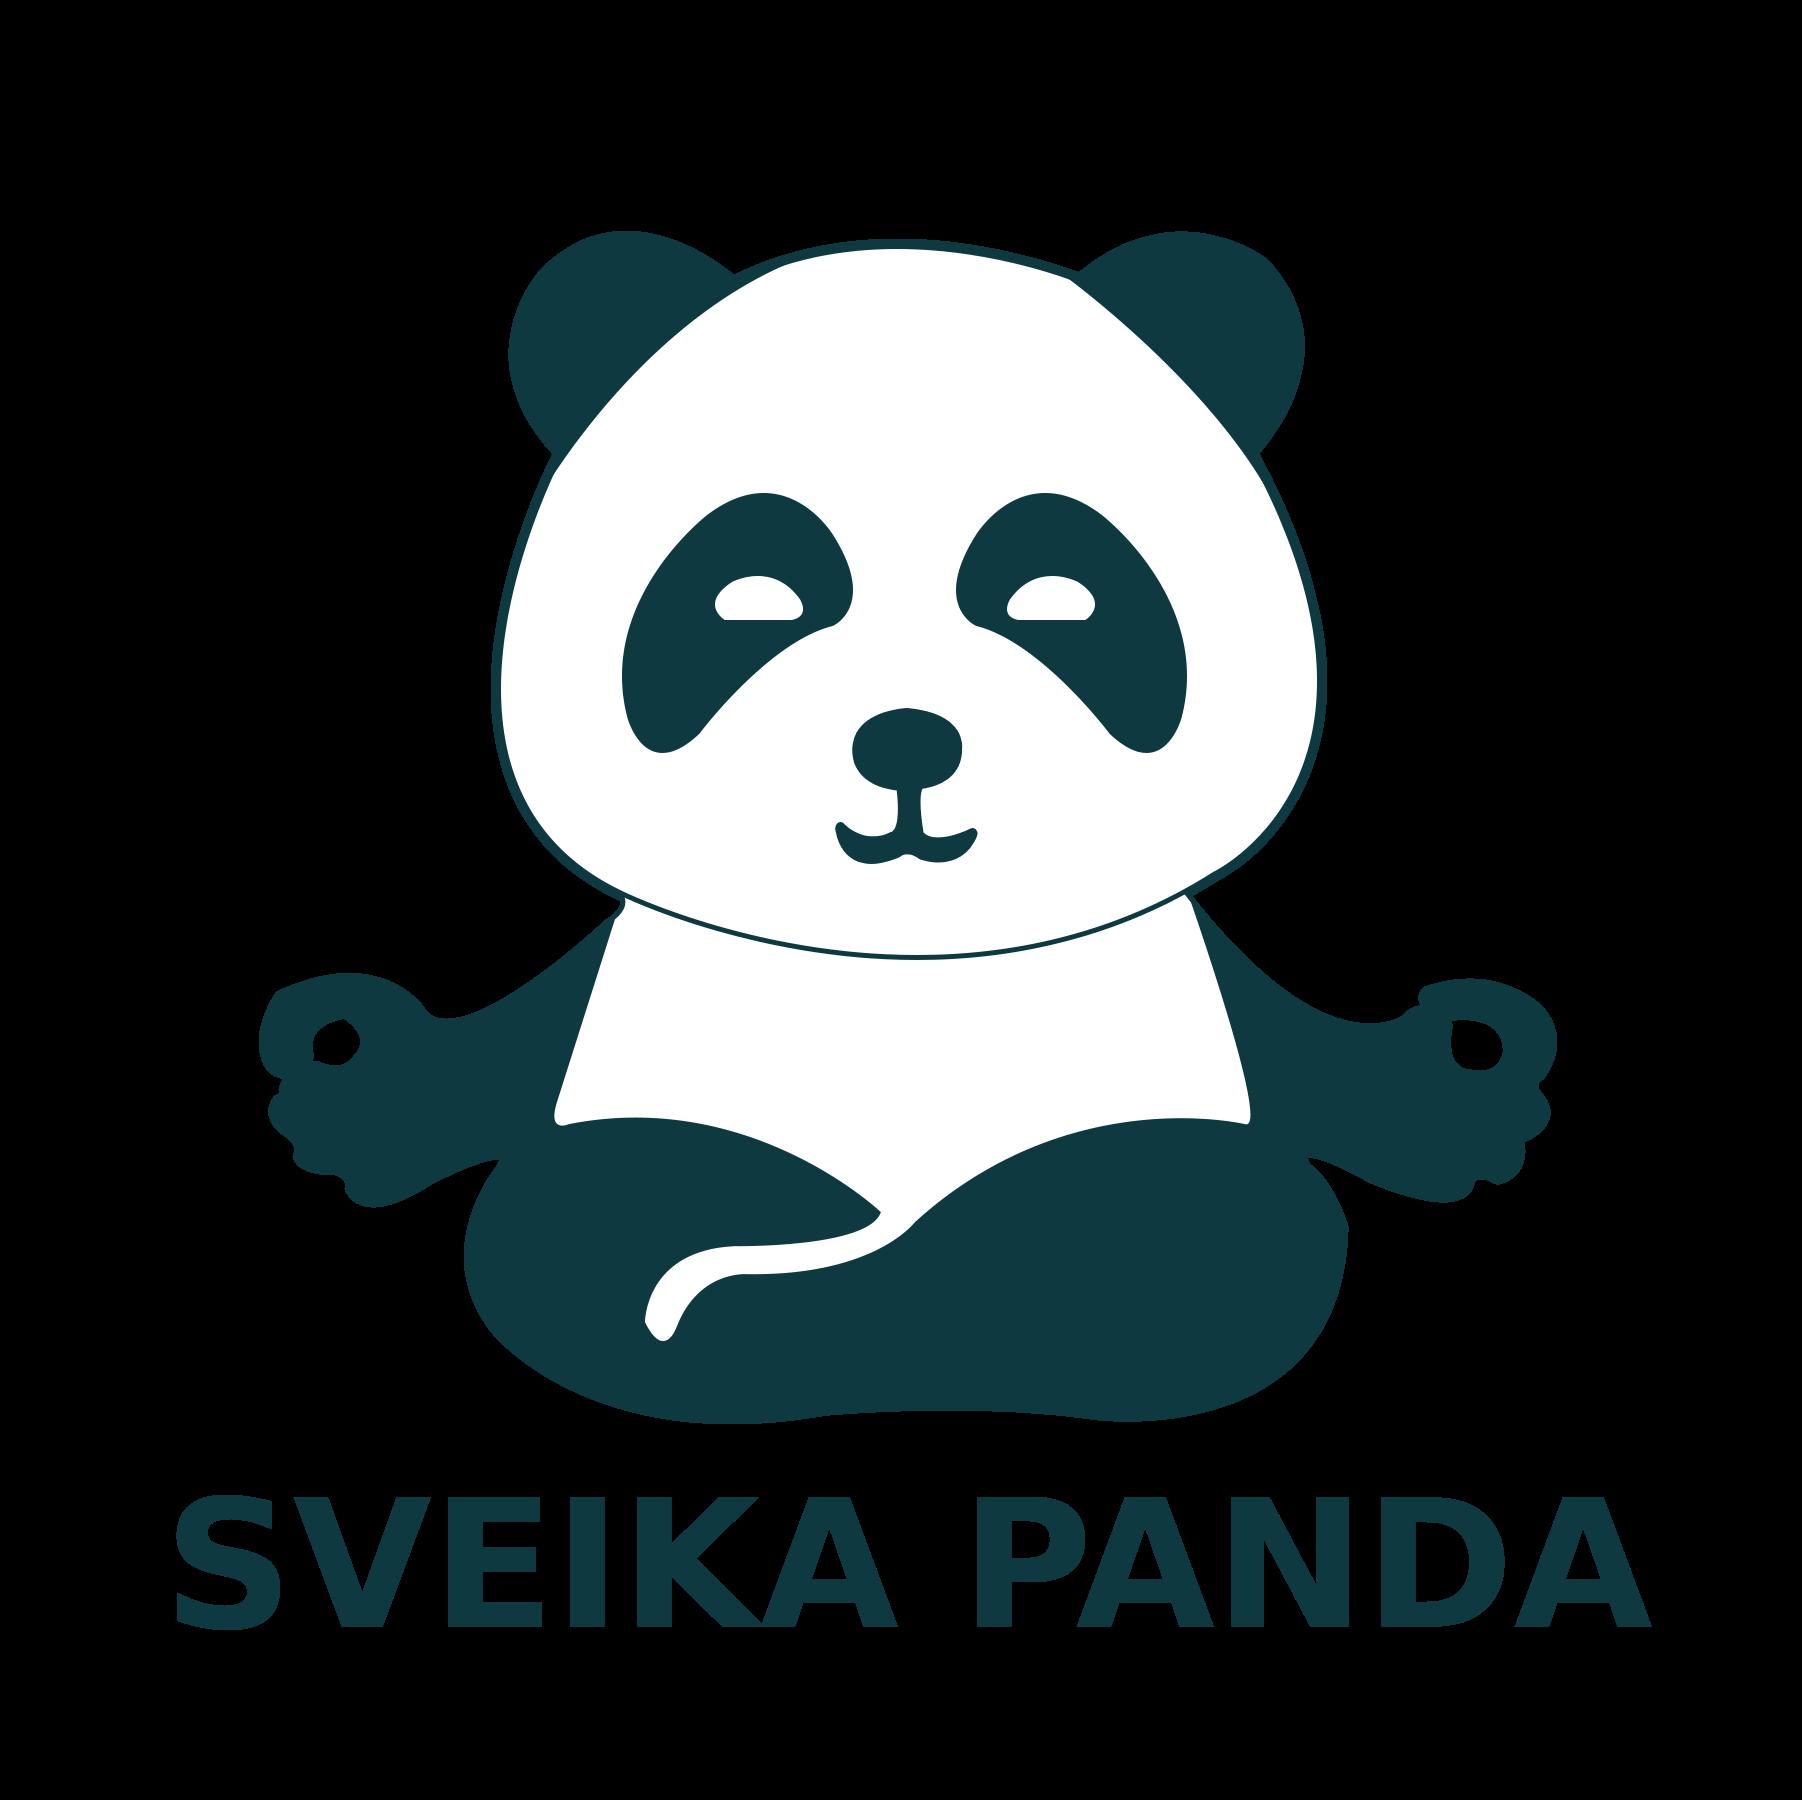 Sveika Panda